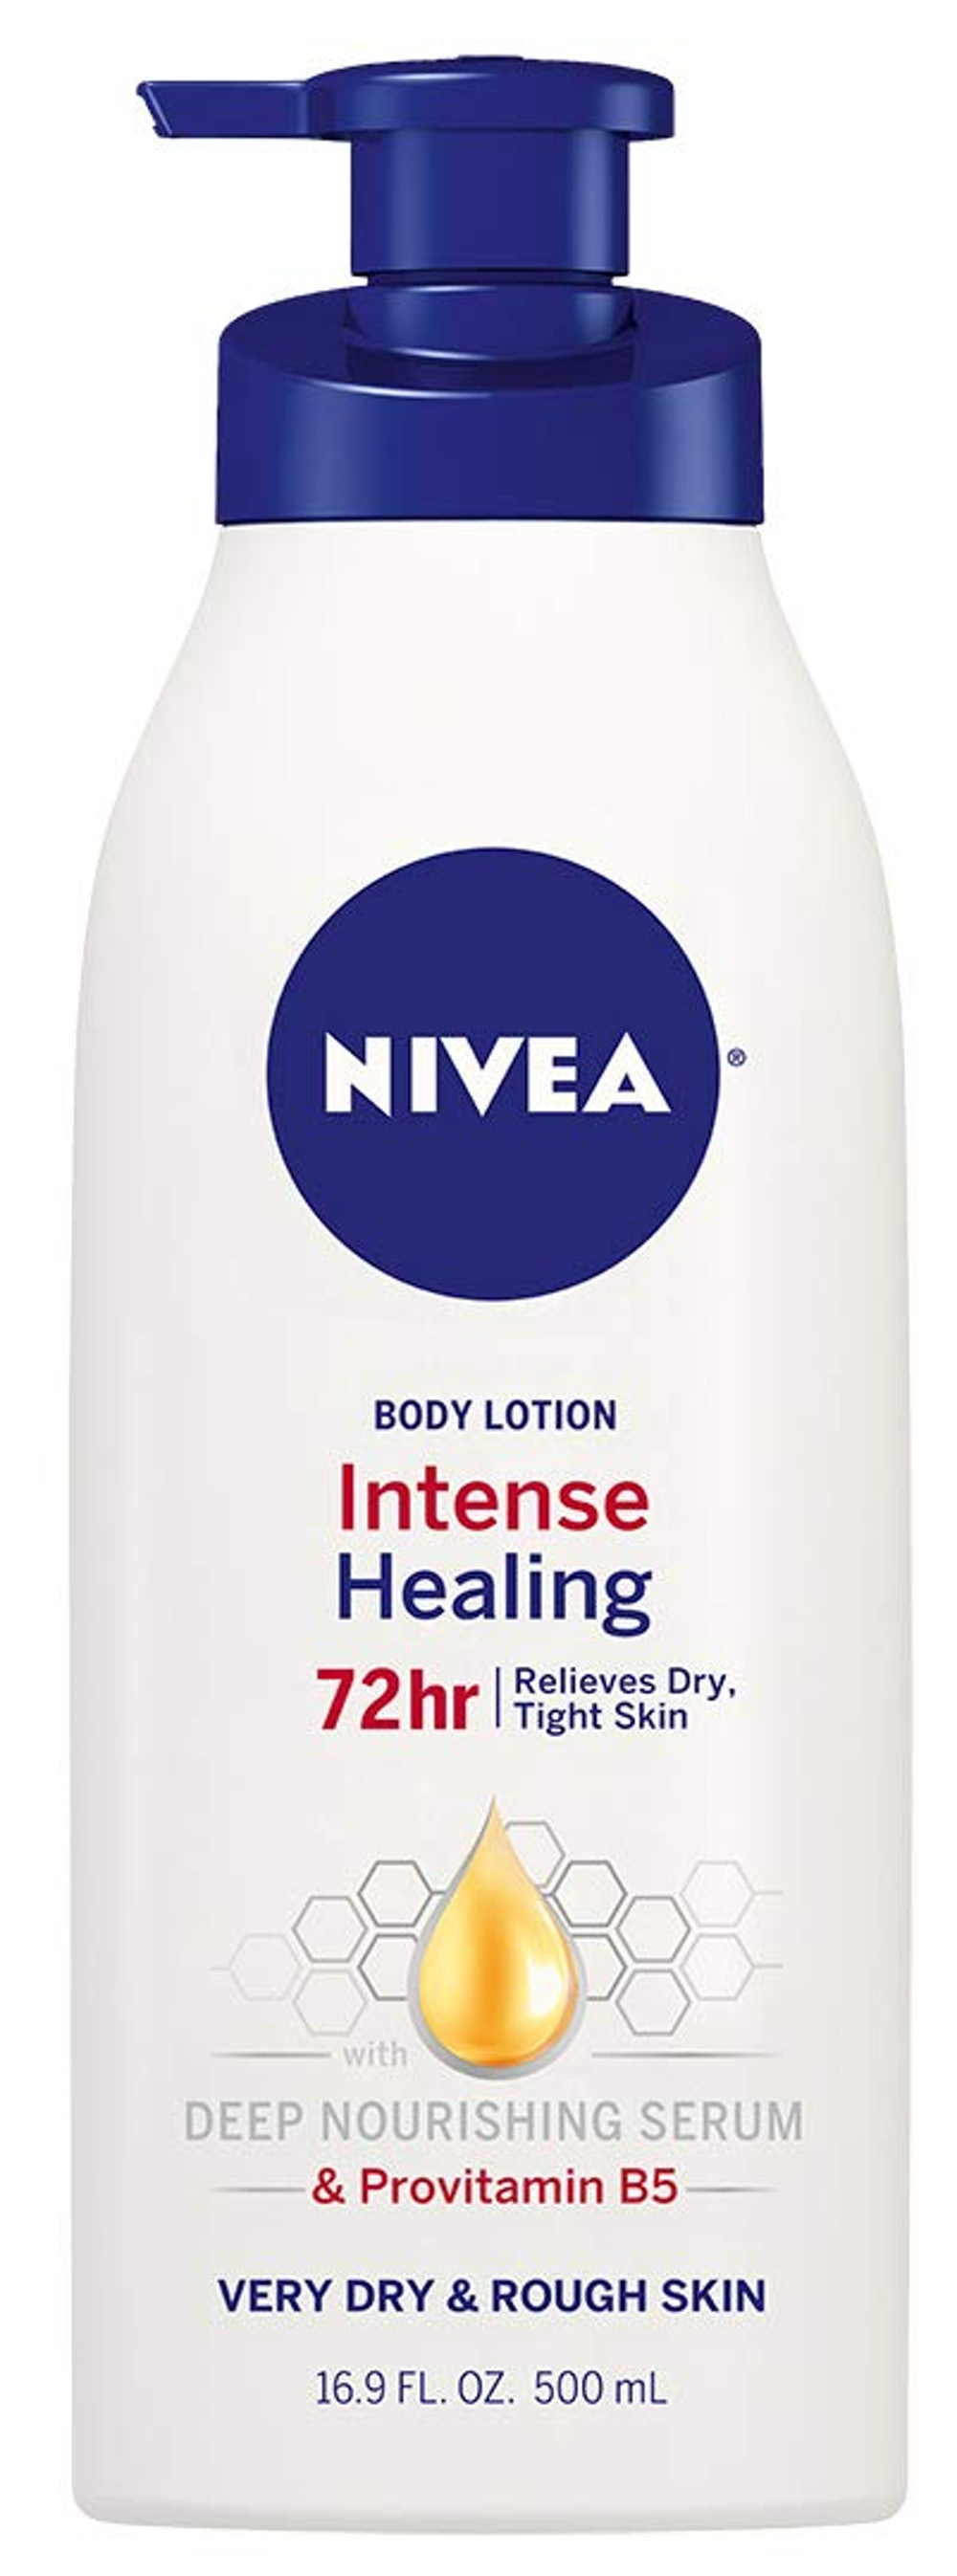 Intense Healing Body Lotion